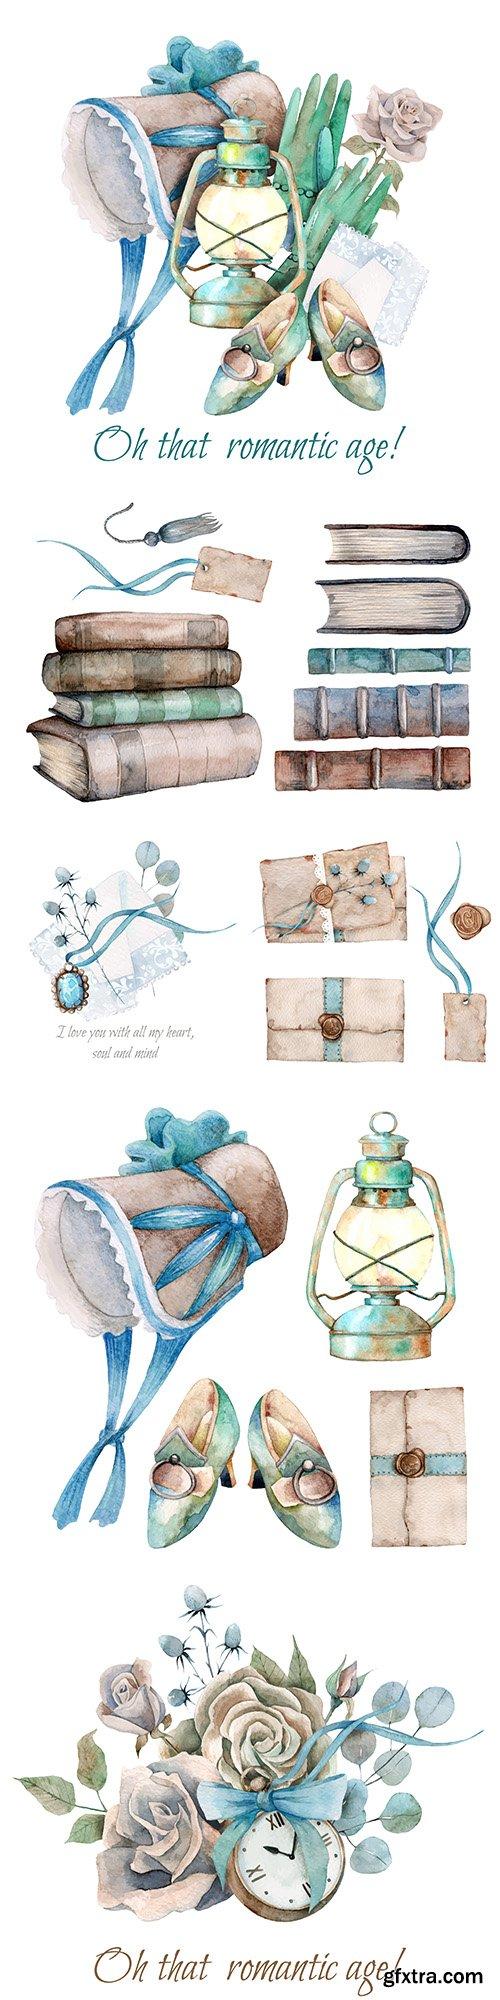 Watercolor composition romantic elements and decorative colors